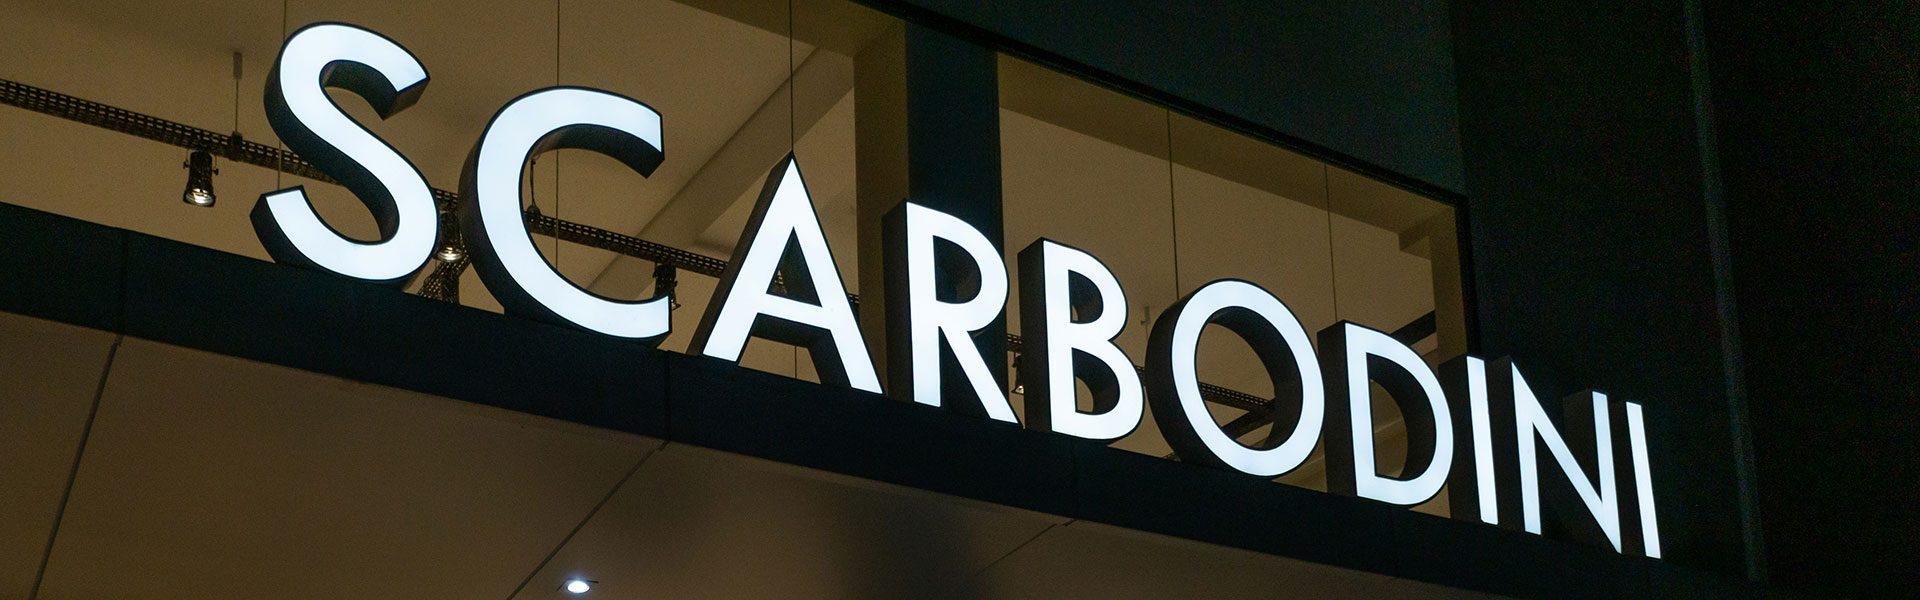 Banner Scarbodini